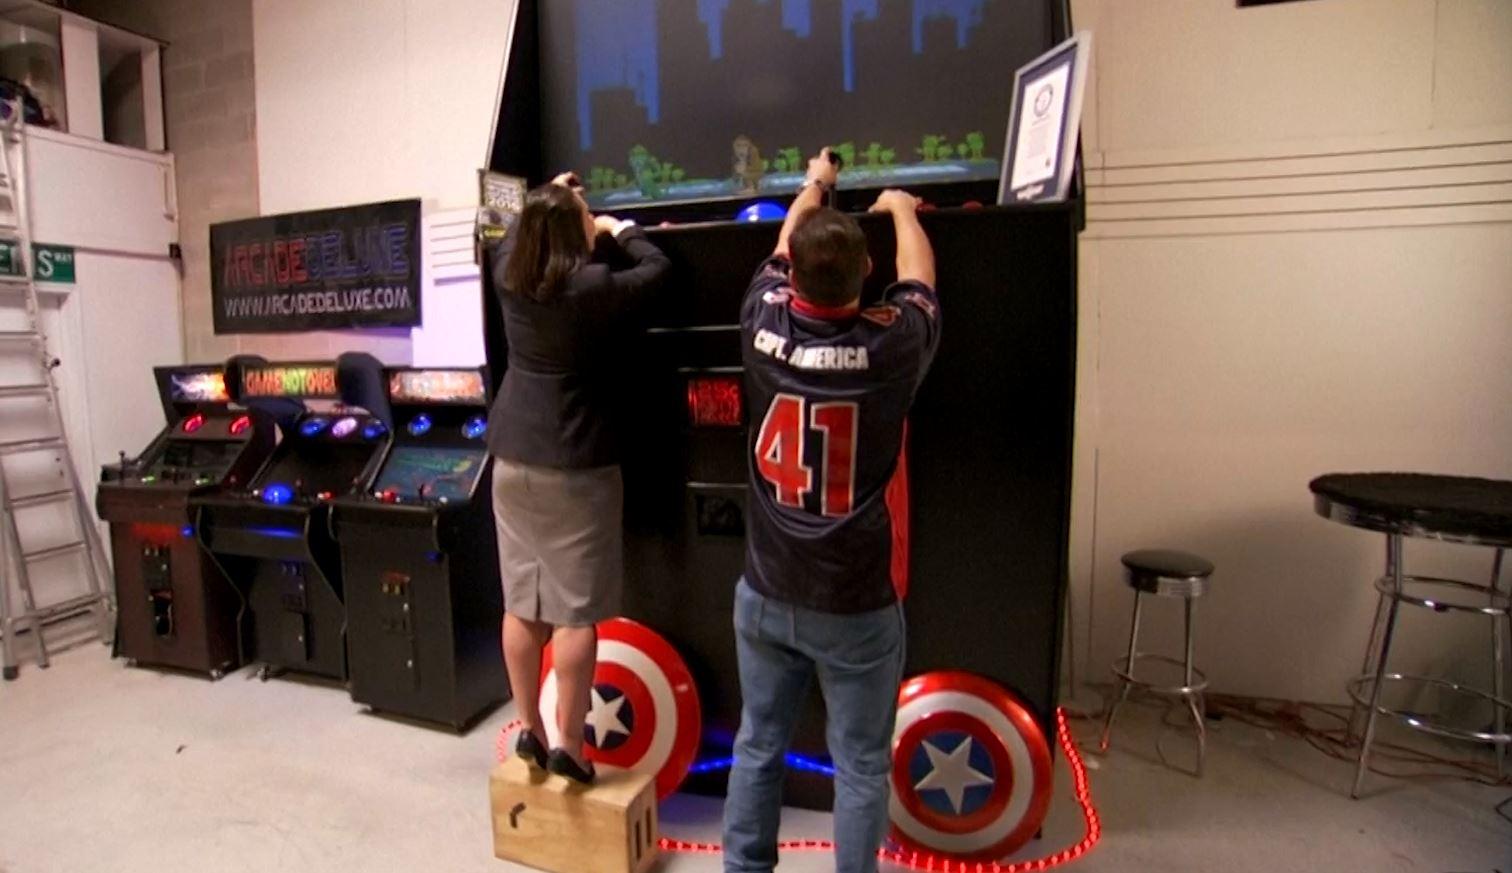 Arcade machine world record 2